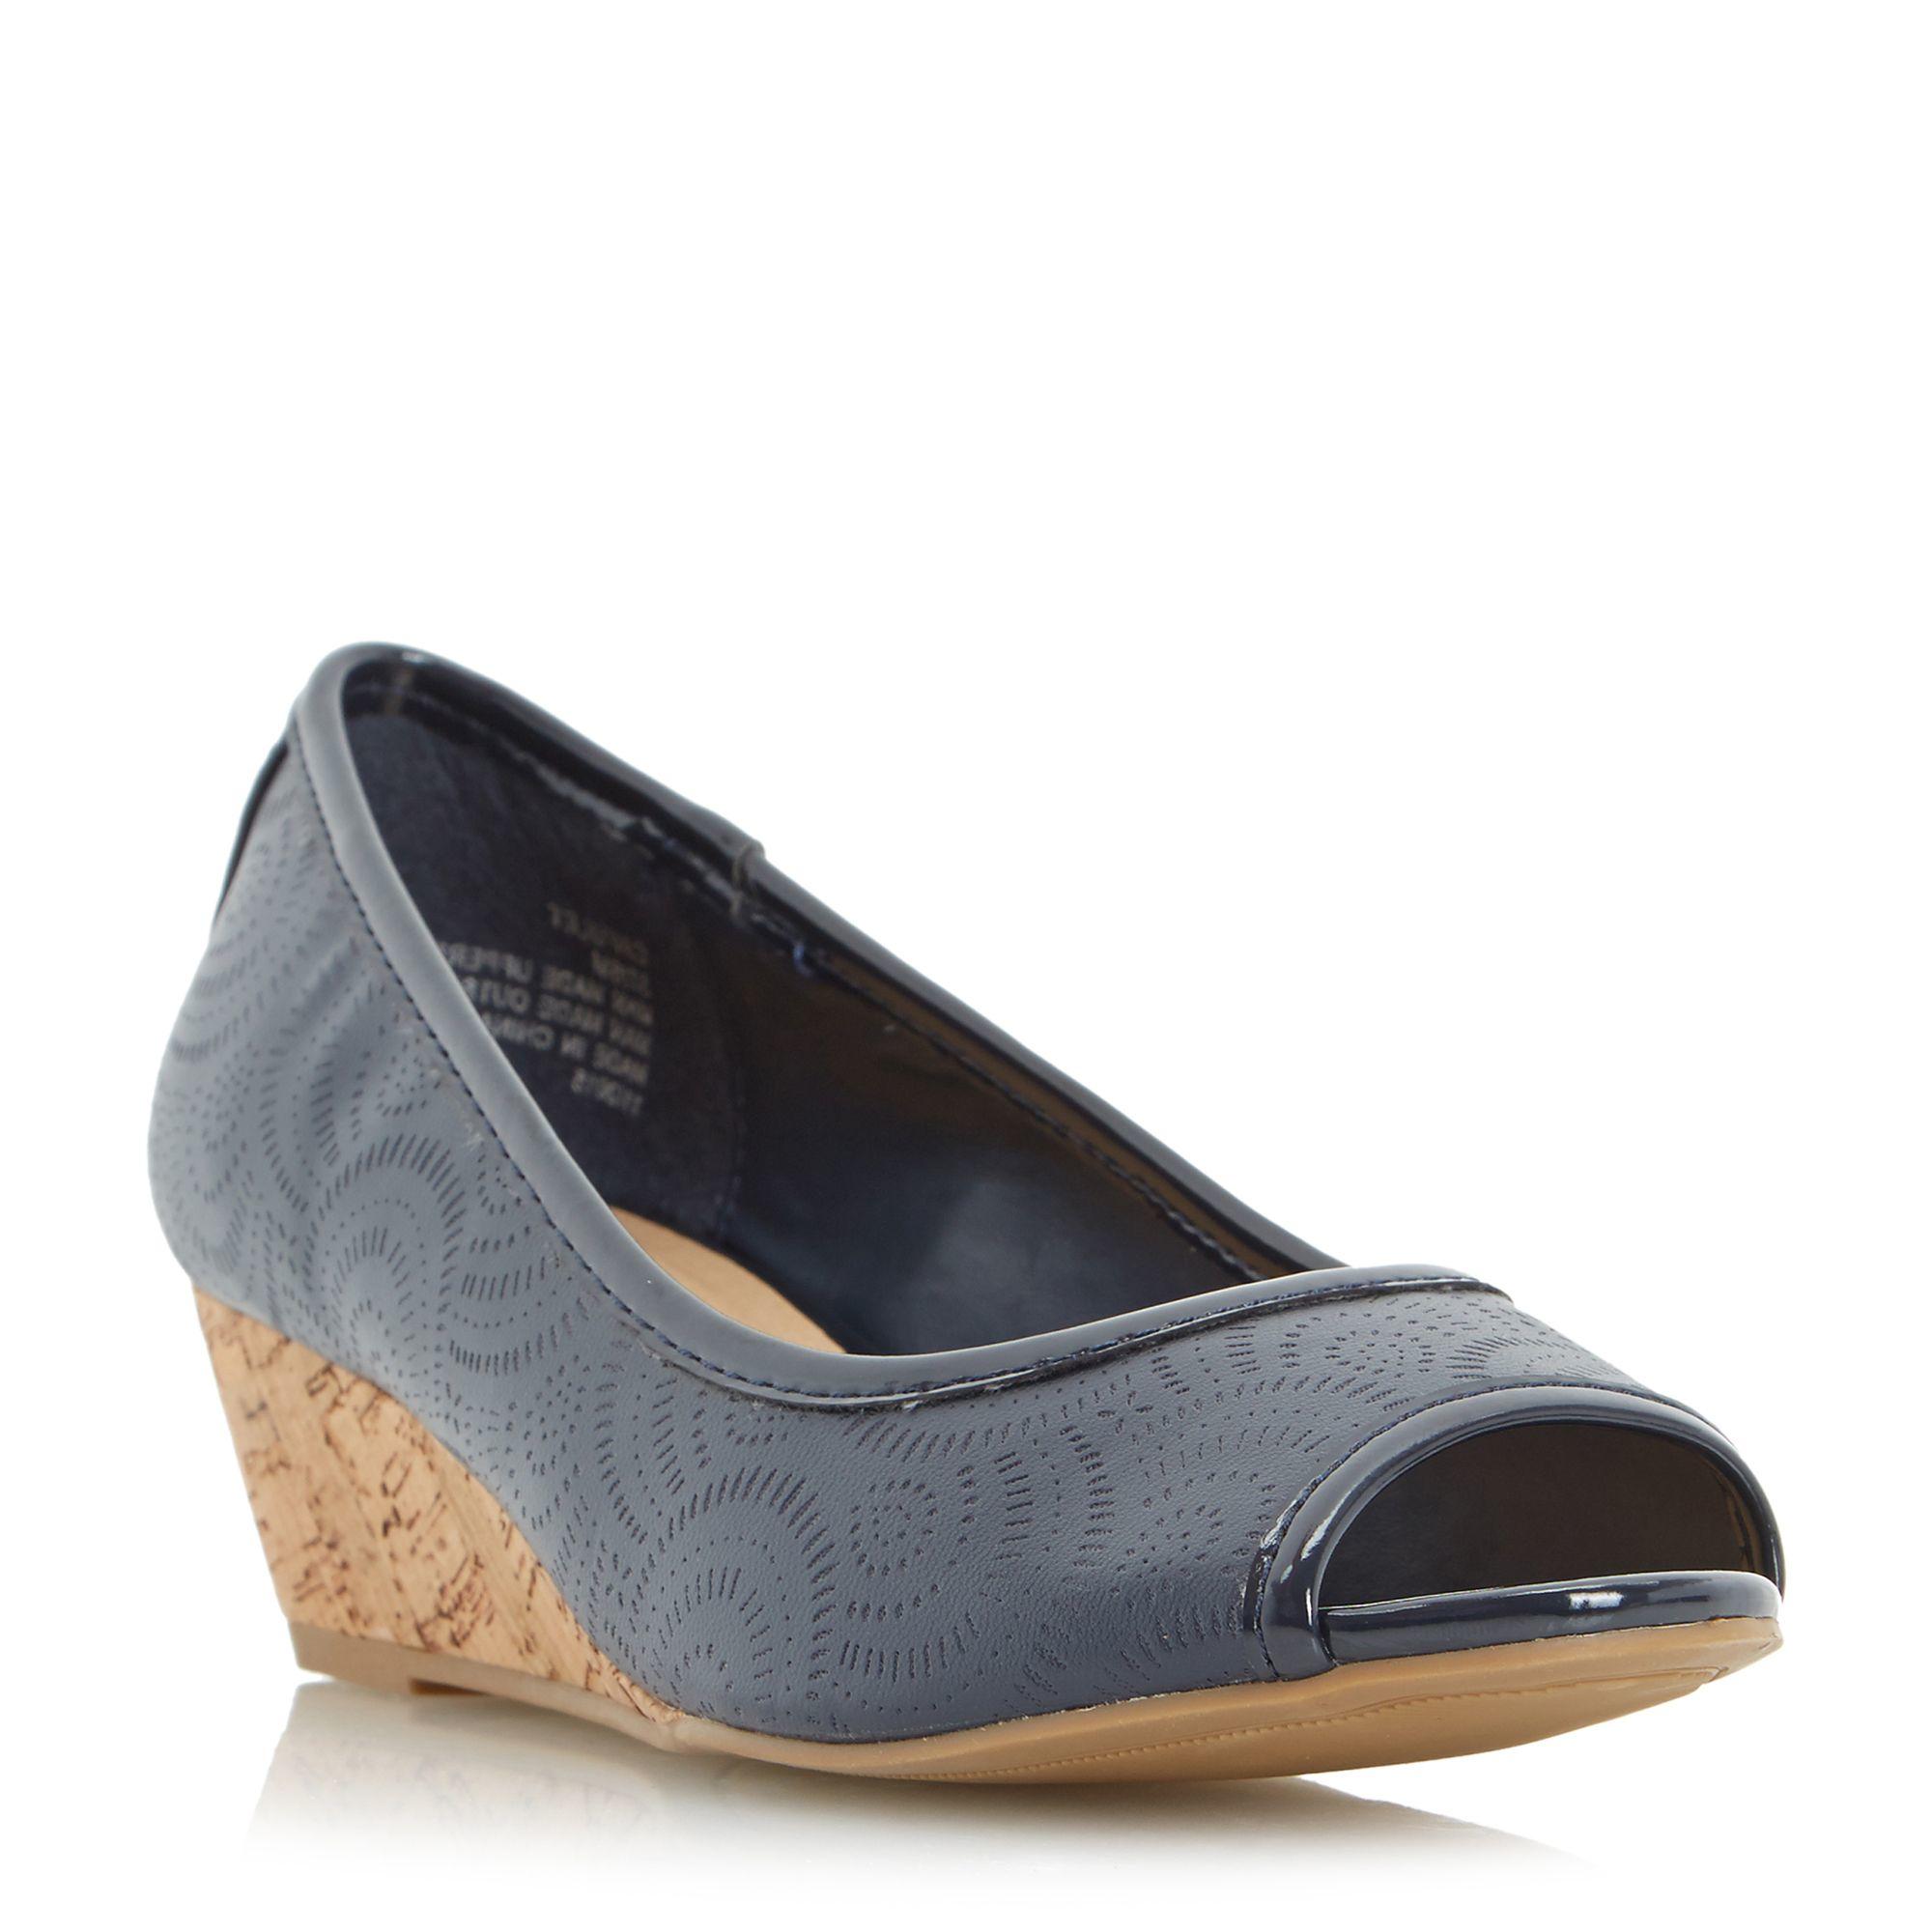 linea capulet cork wedge peep toe court shoes in blue